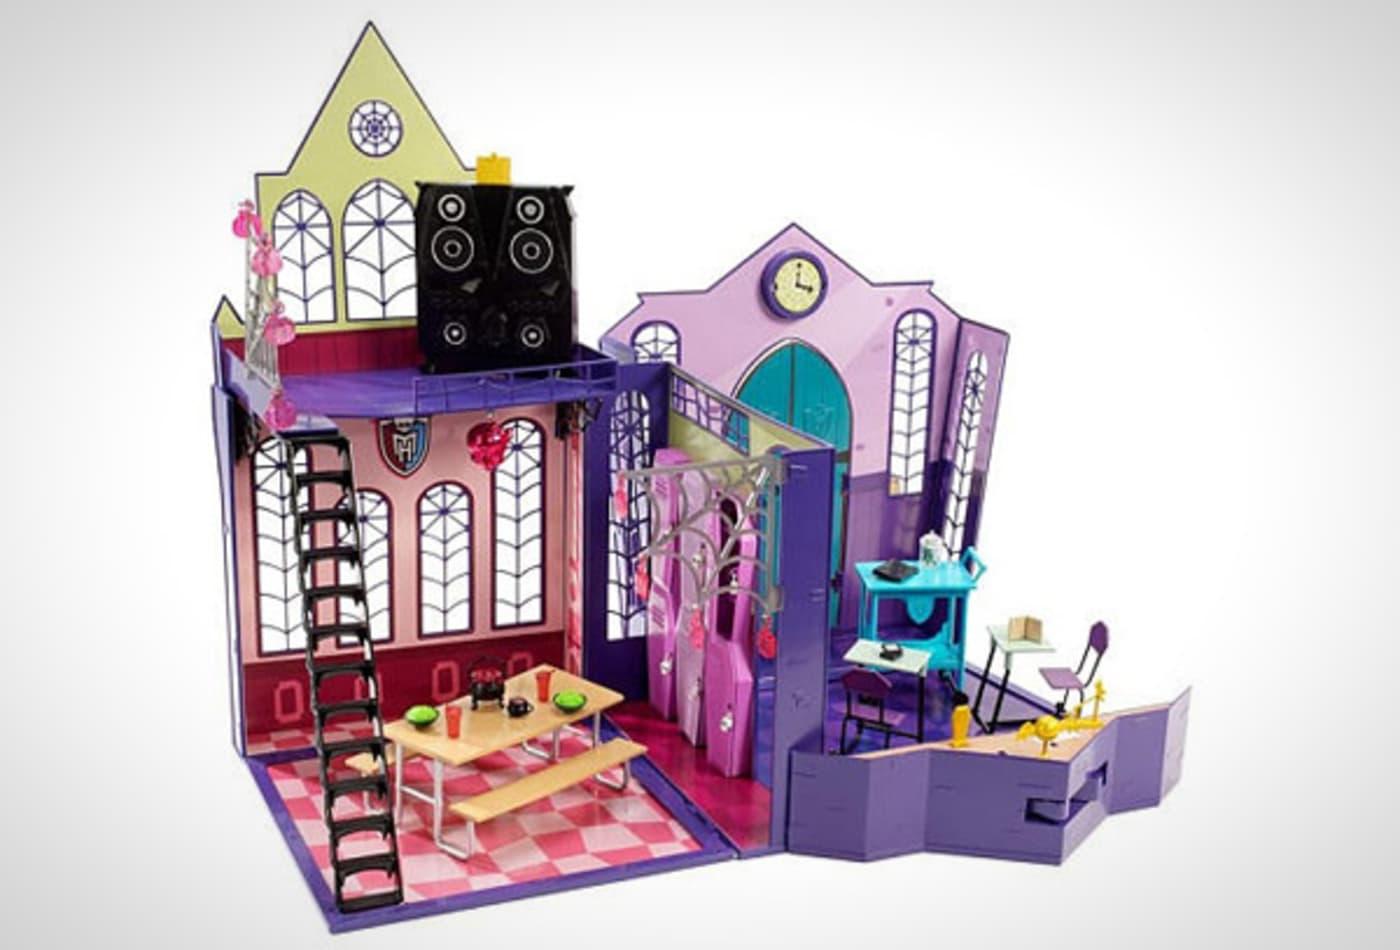 hot-toys-2012-monsters-high-school-playset.jpg